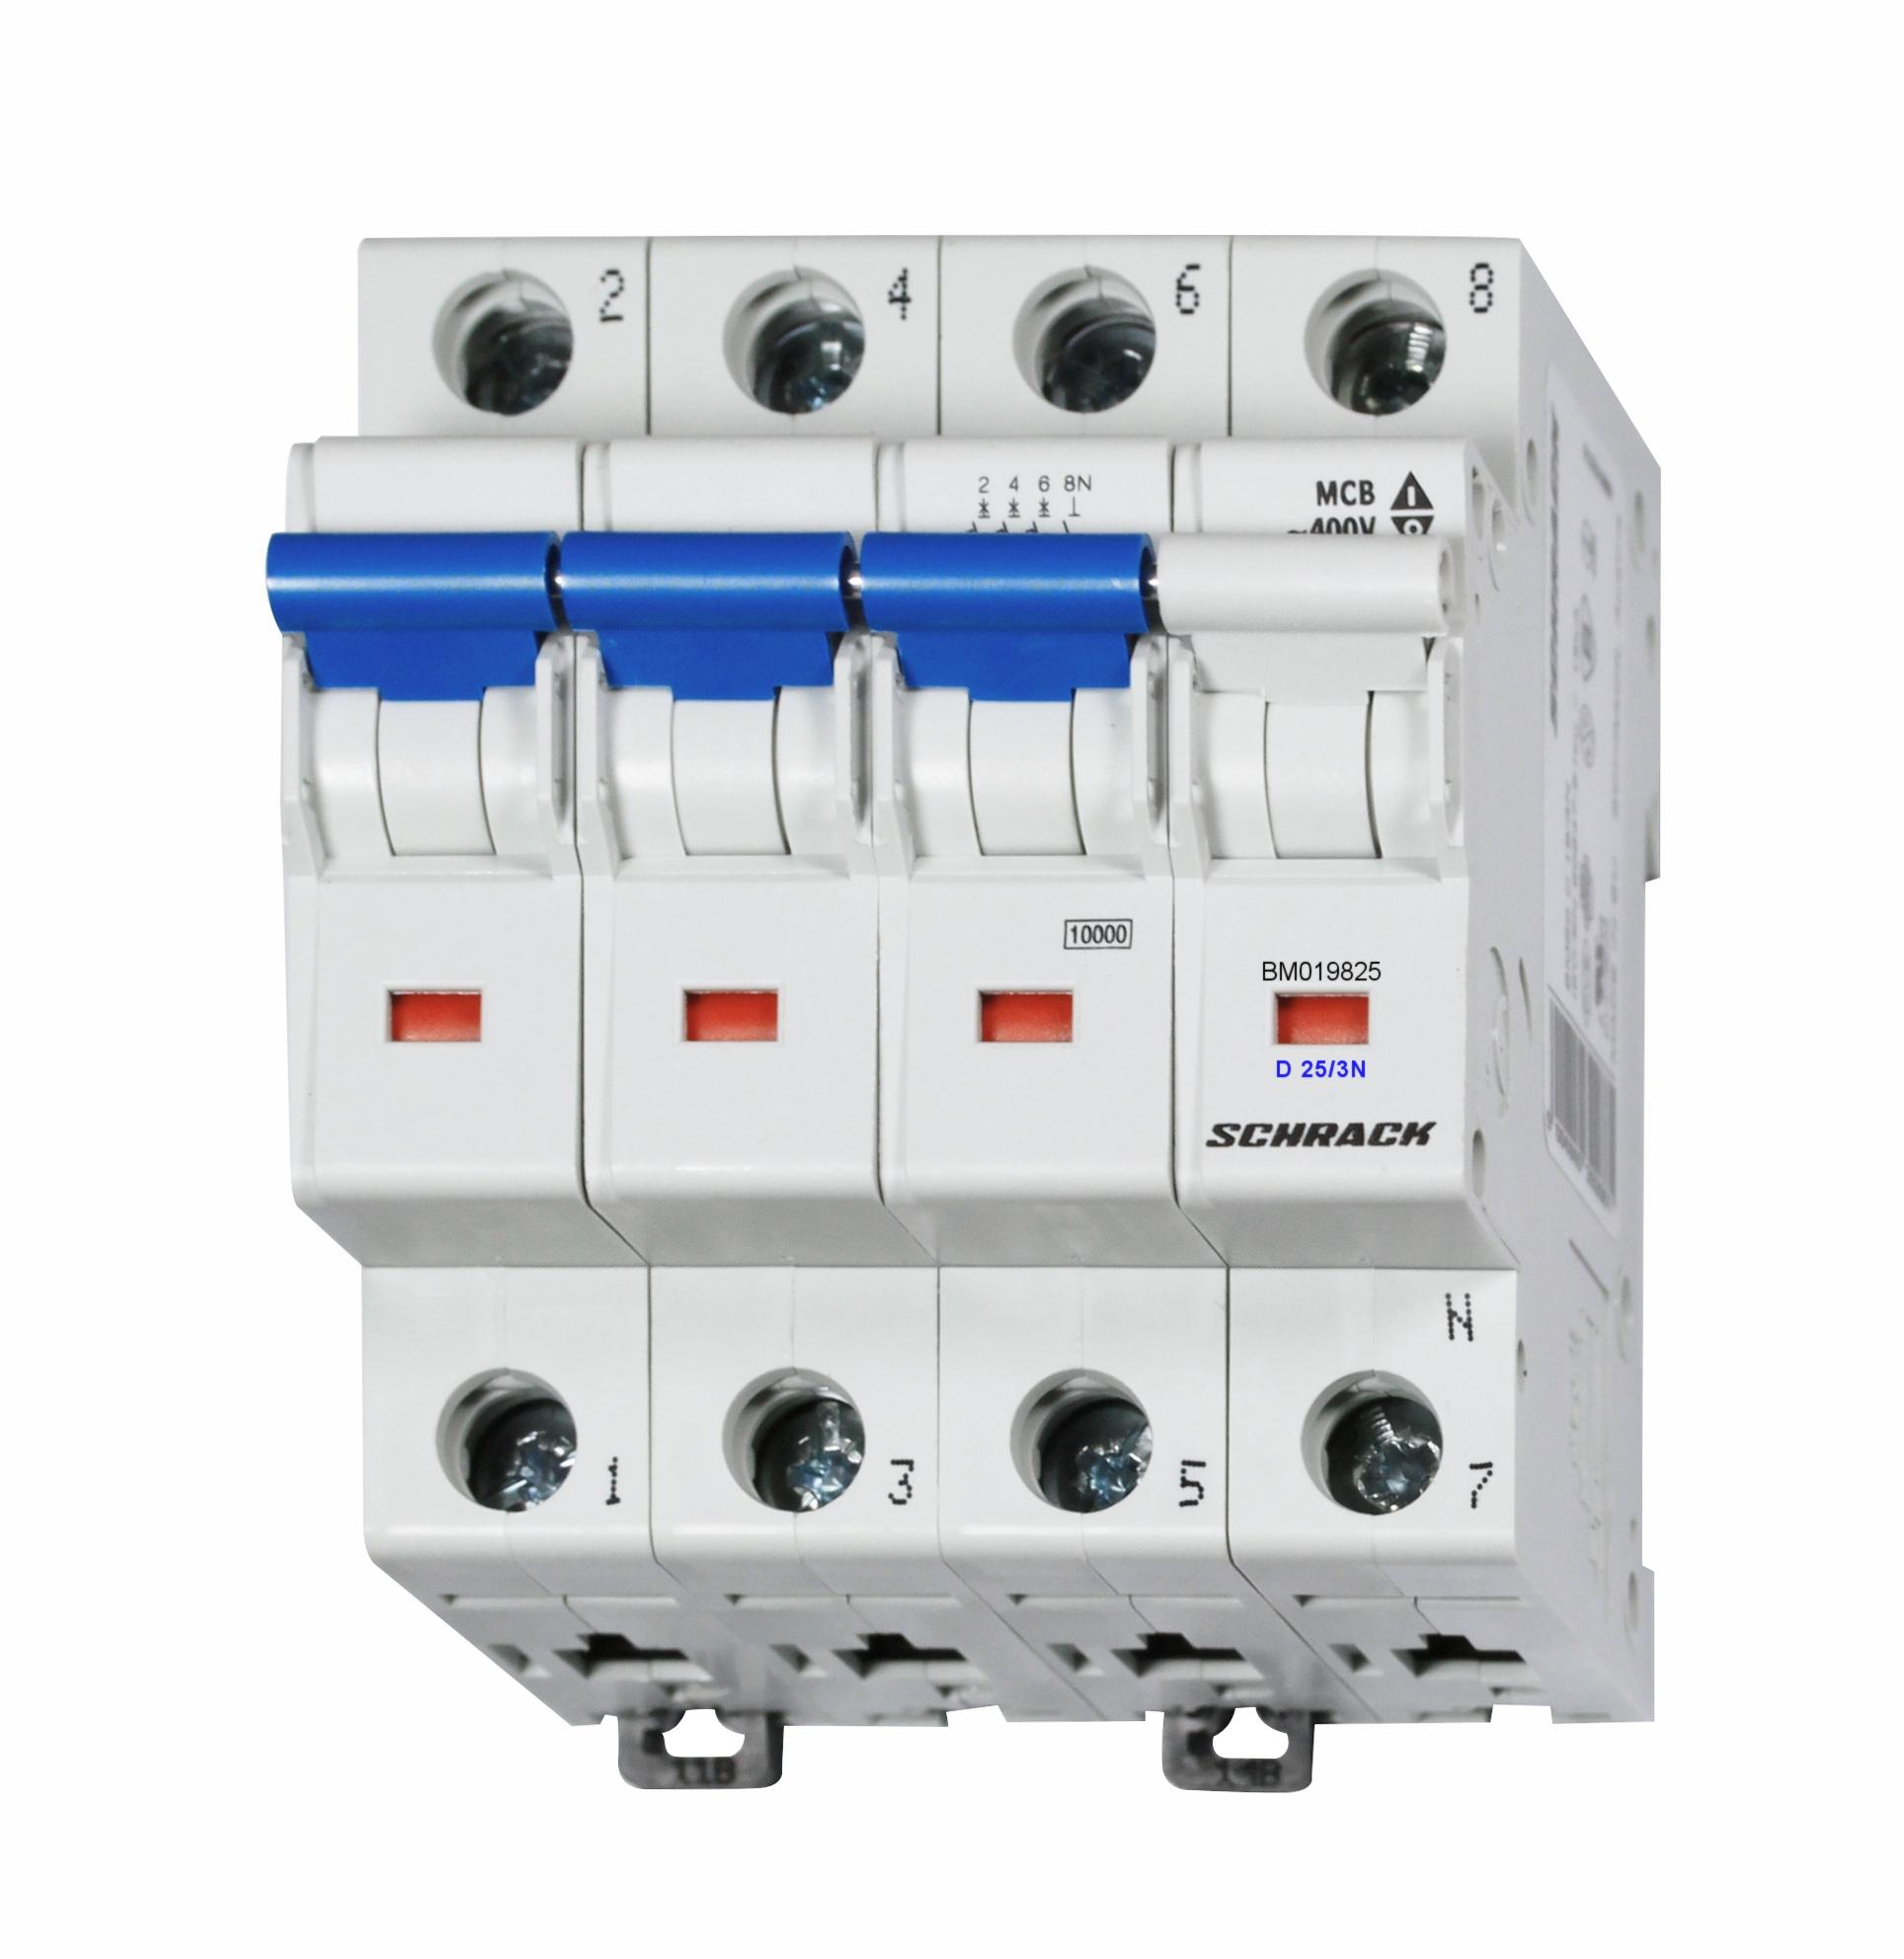 BM019825 - Schrack Technik